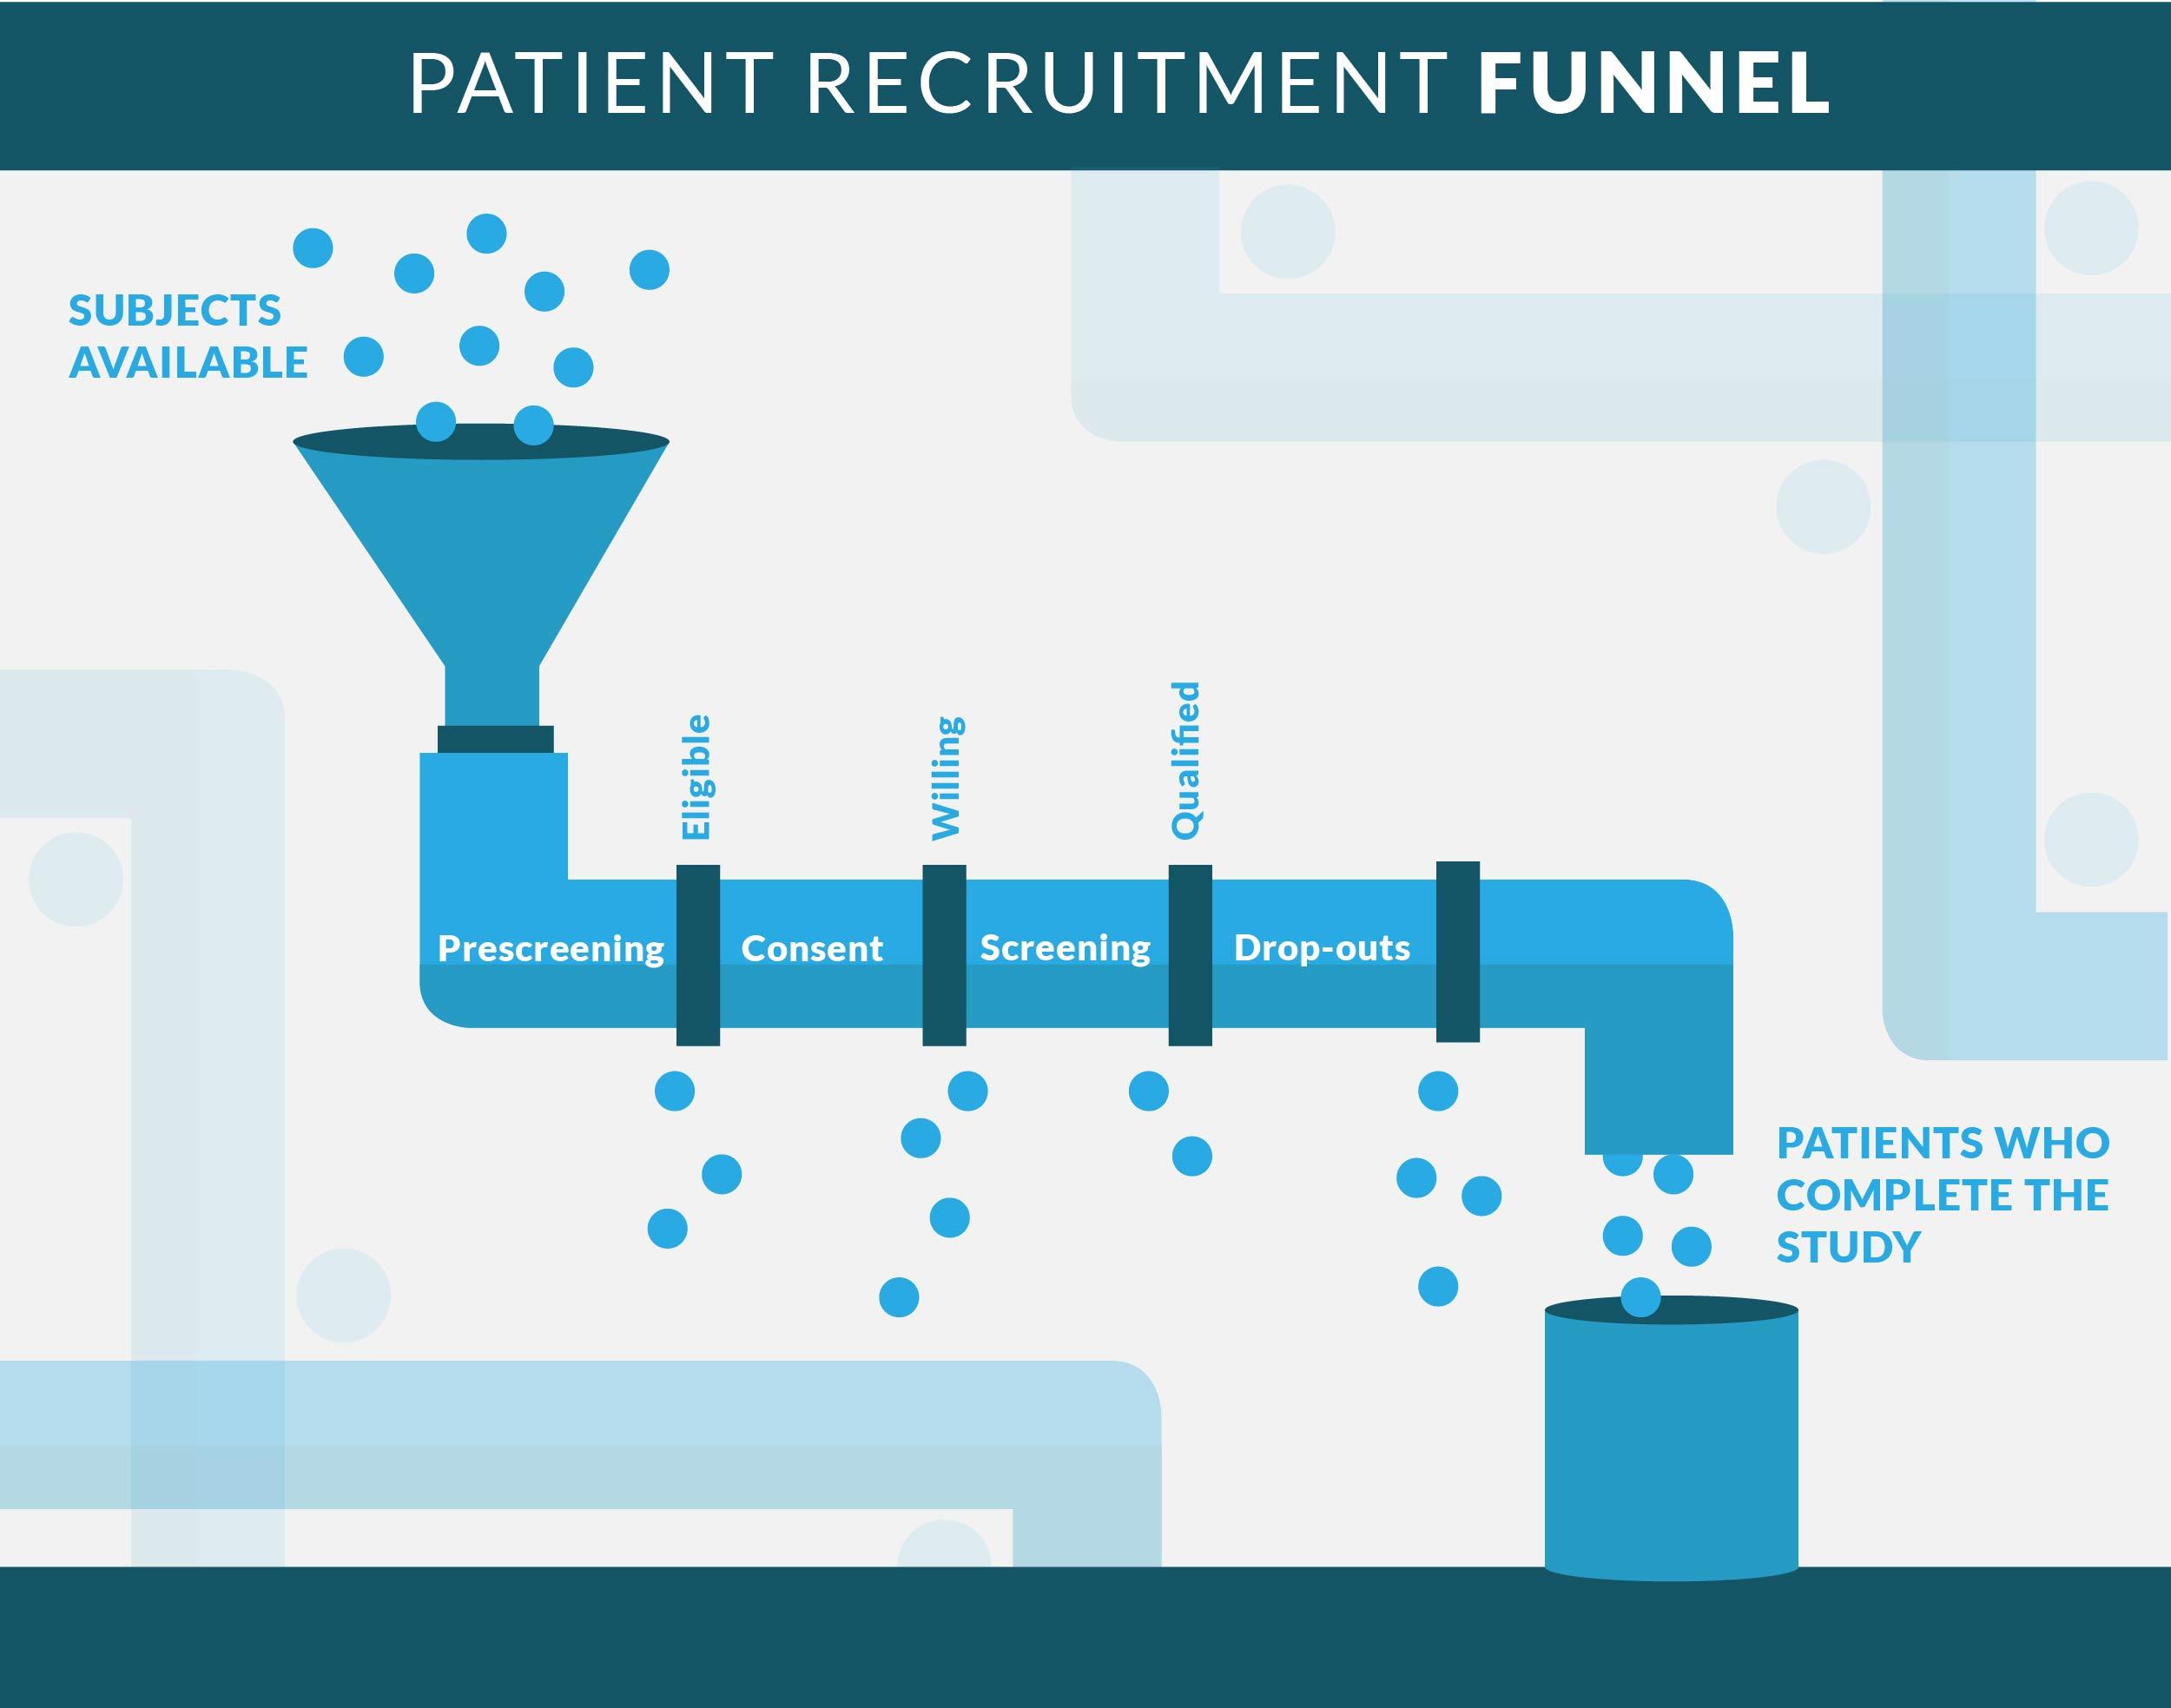 LeakyPipe_PatientRecruitment-01-1.jpg